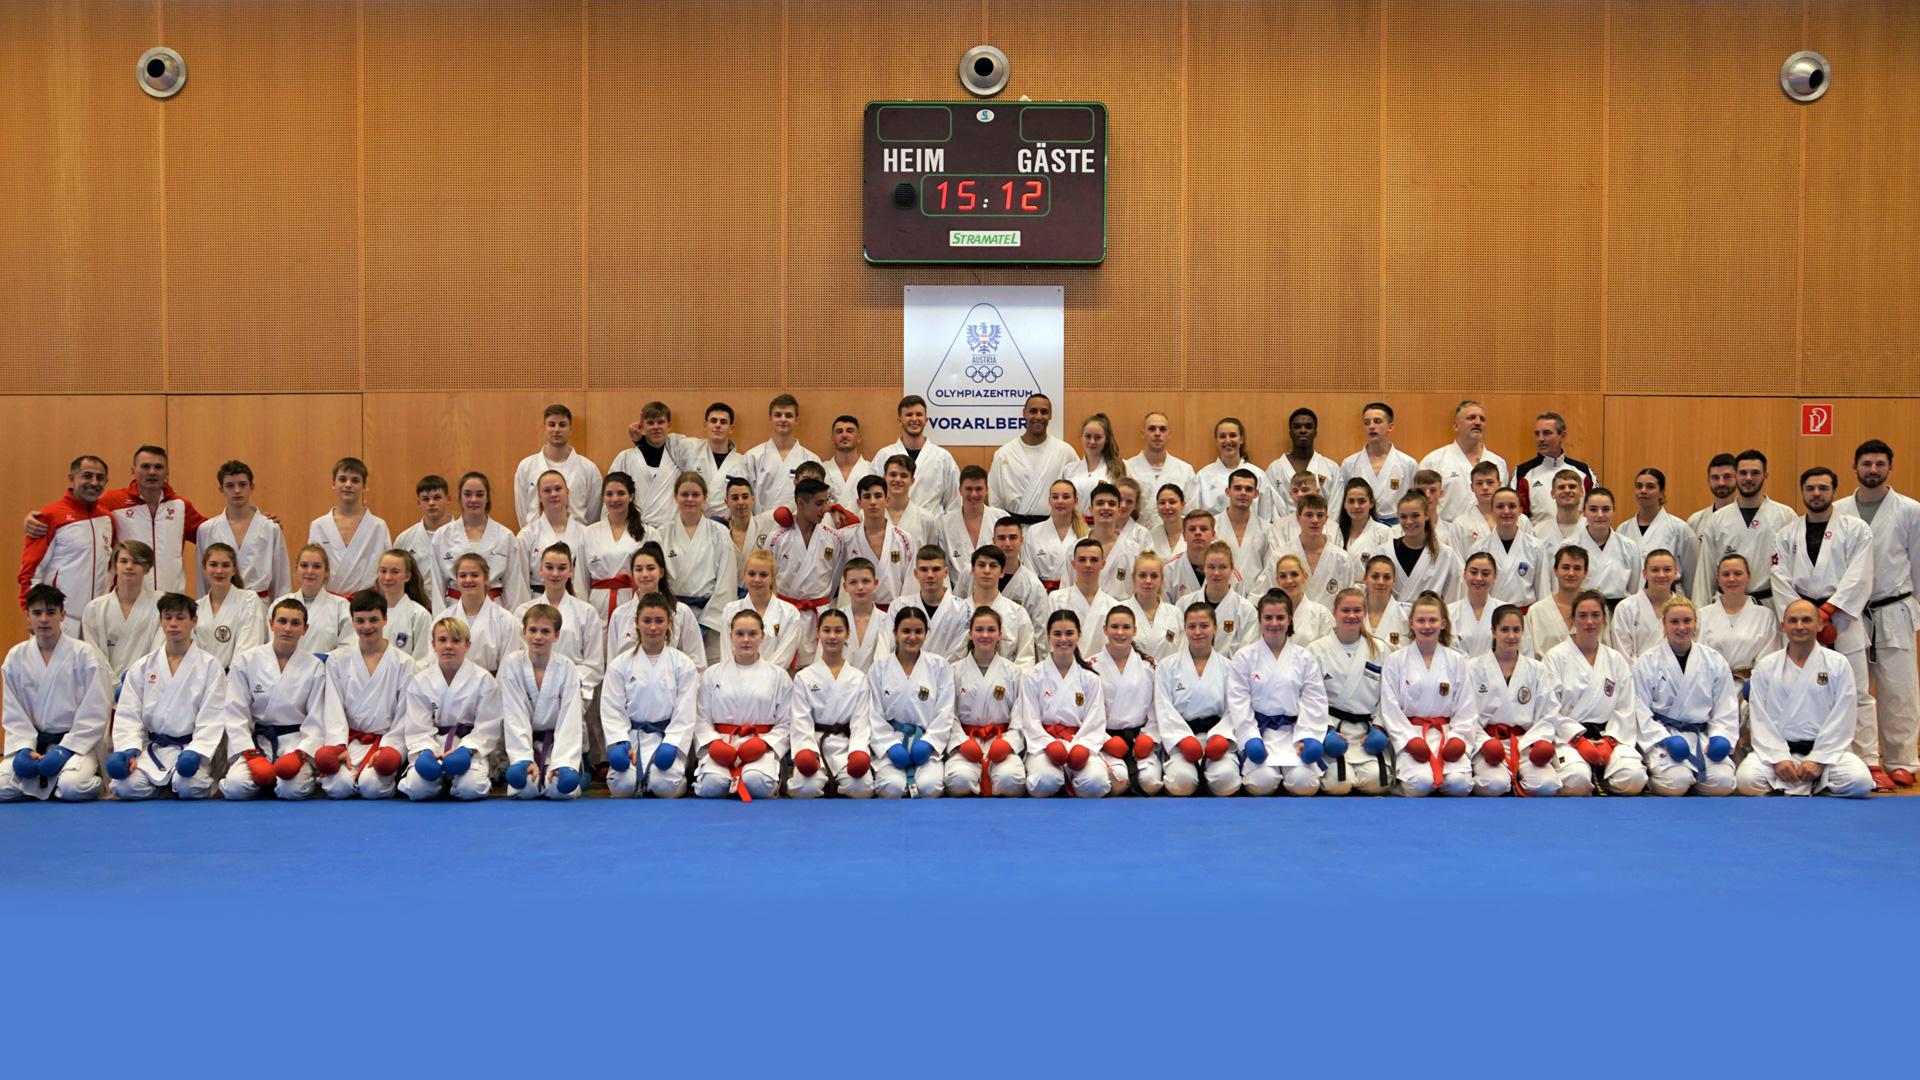 Karate Trainingscamp WILA | Dornbirn in Vorarlberg | Leitung Dragan Leiler und Daniel Devigili | Vorbereitung Karate Olympia 2020